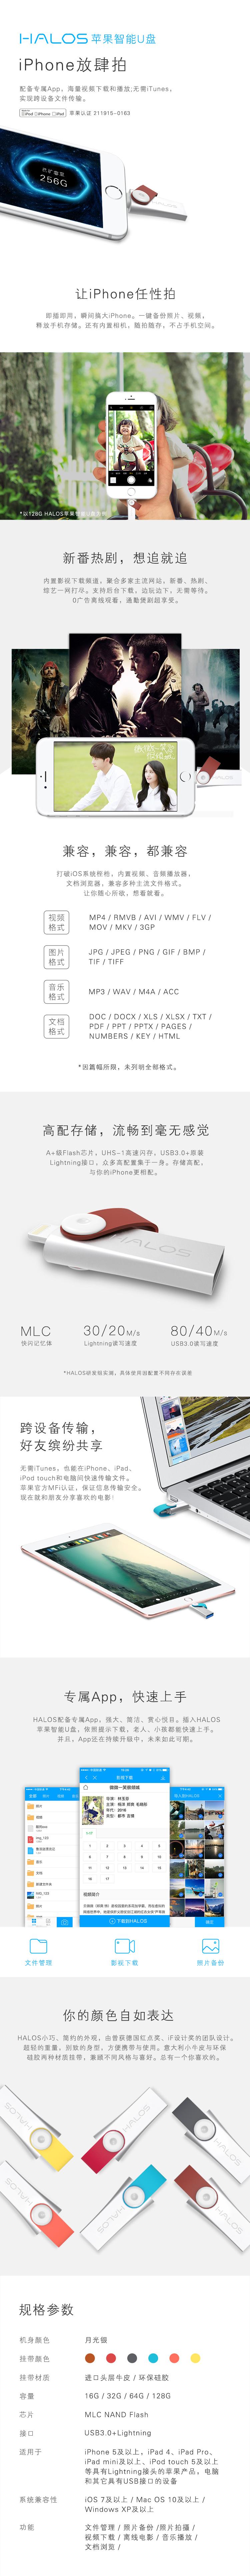 Halos 苹果智能U盘 手机U盘32G 苹果官方MFI认证